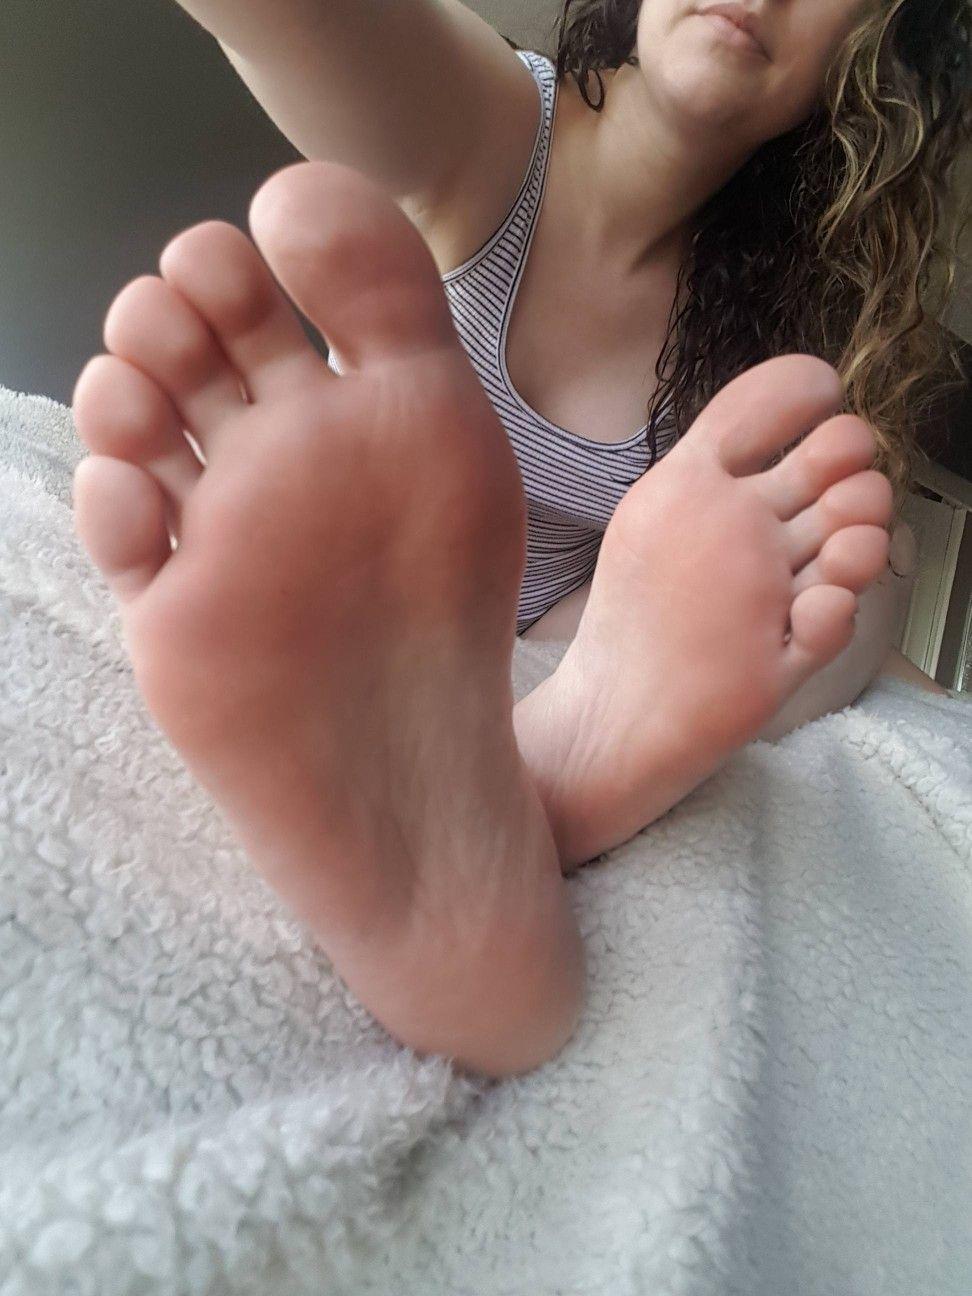 porn-teen-soles-pictures-mendes